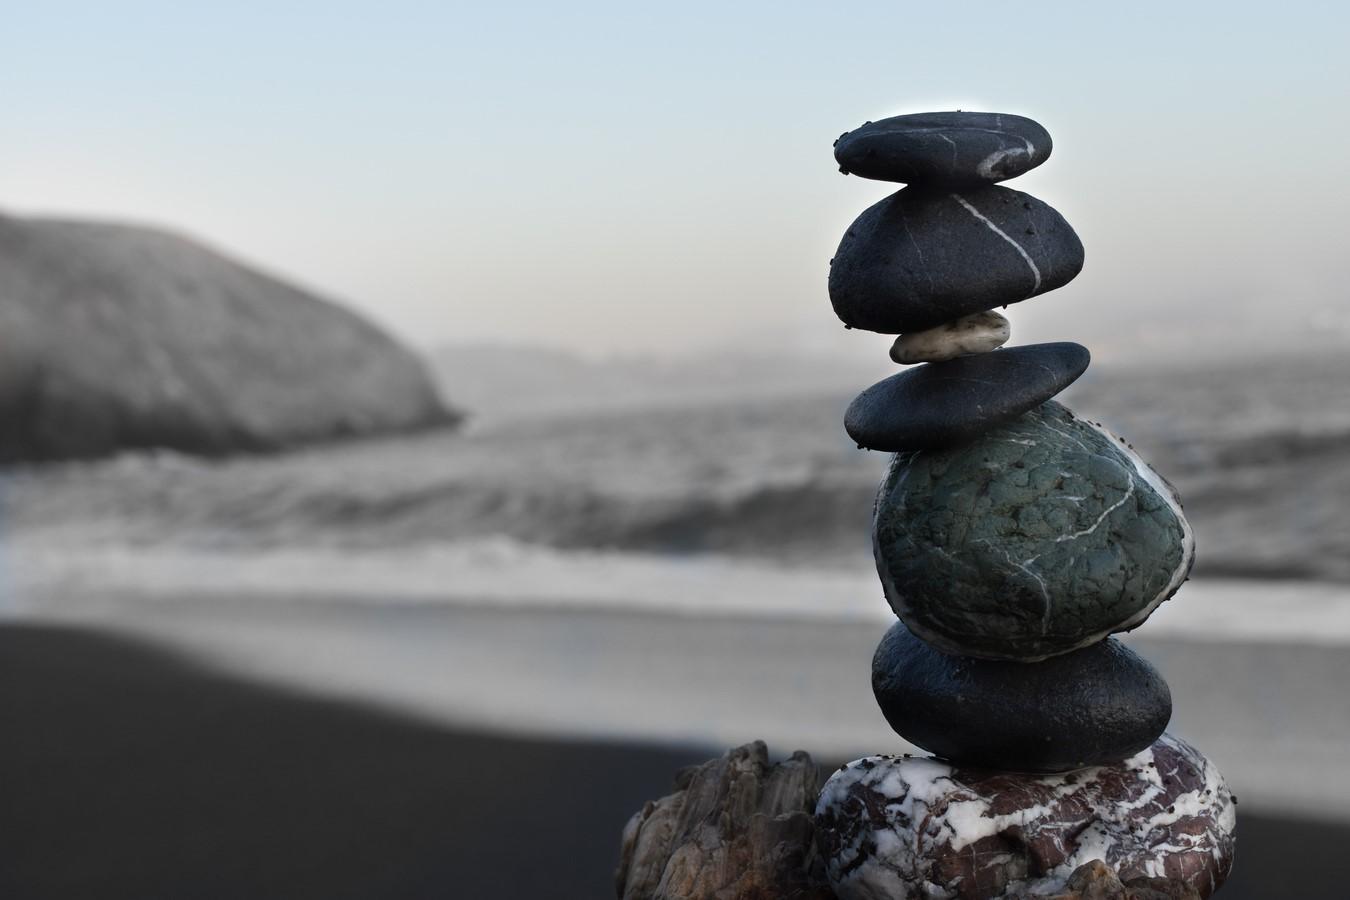 Architects: How to achieve work-life balance - Sheet1